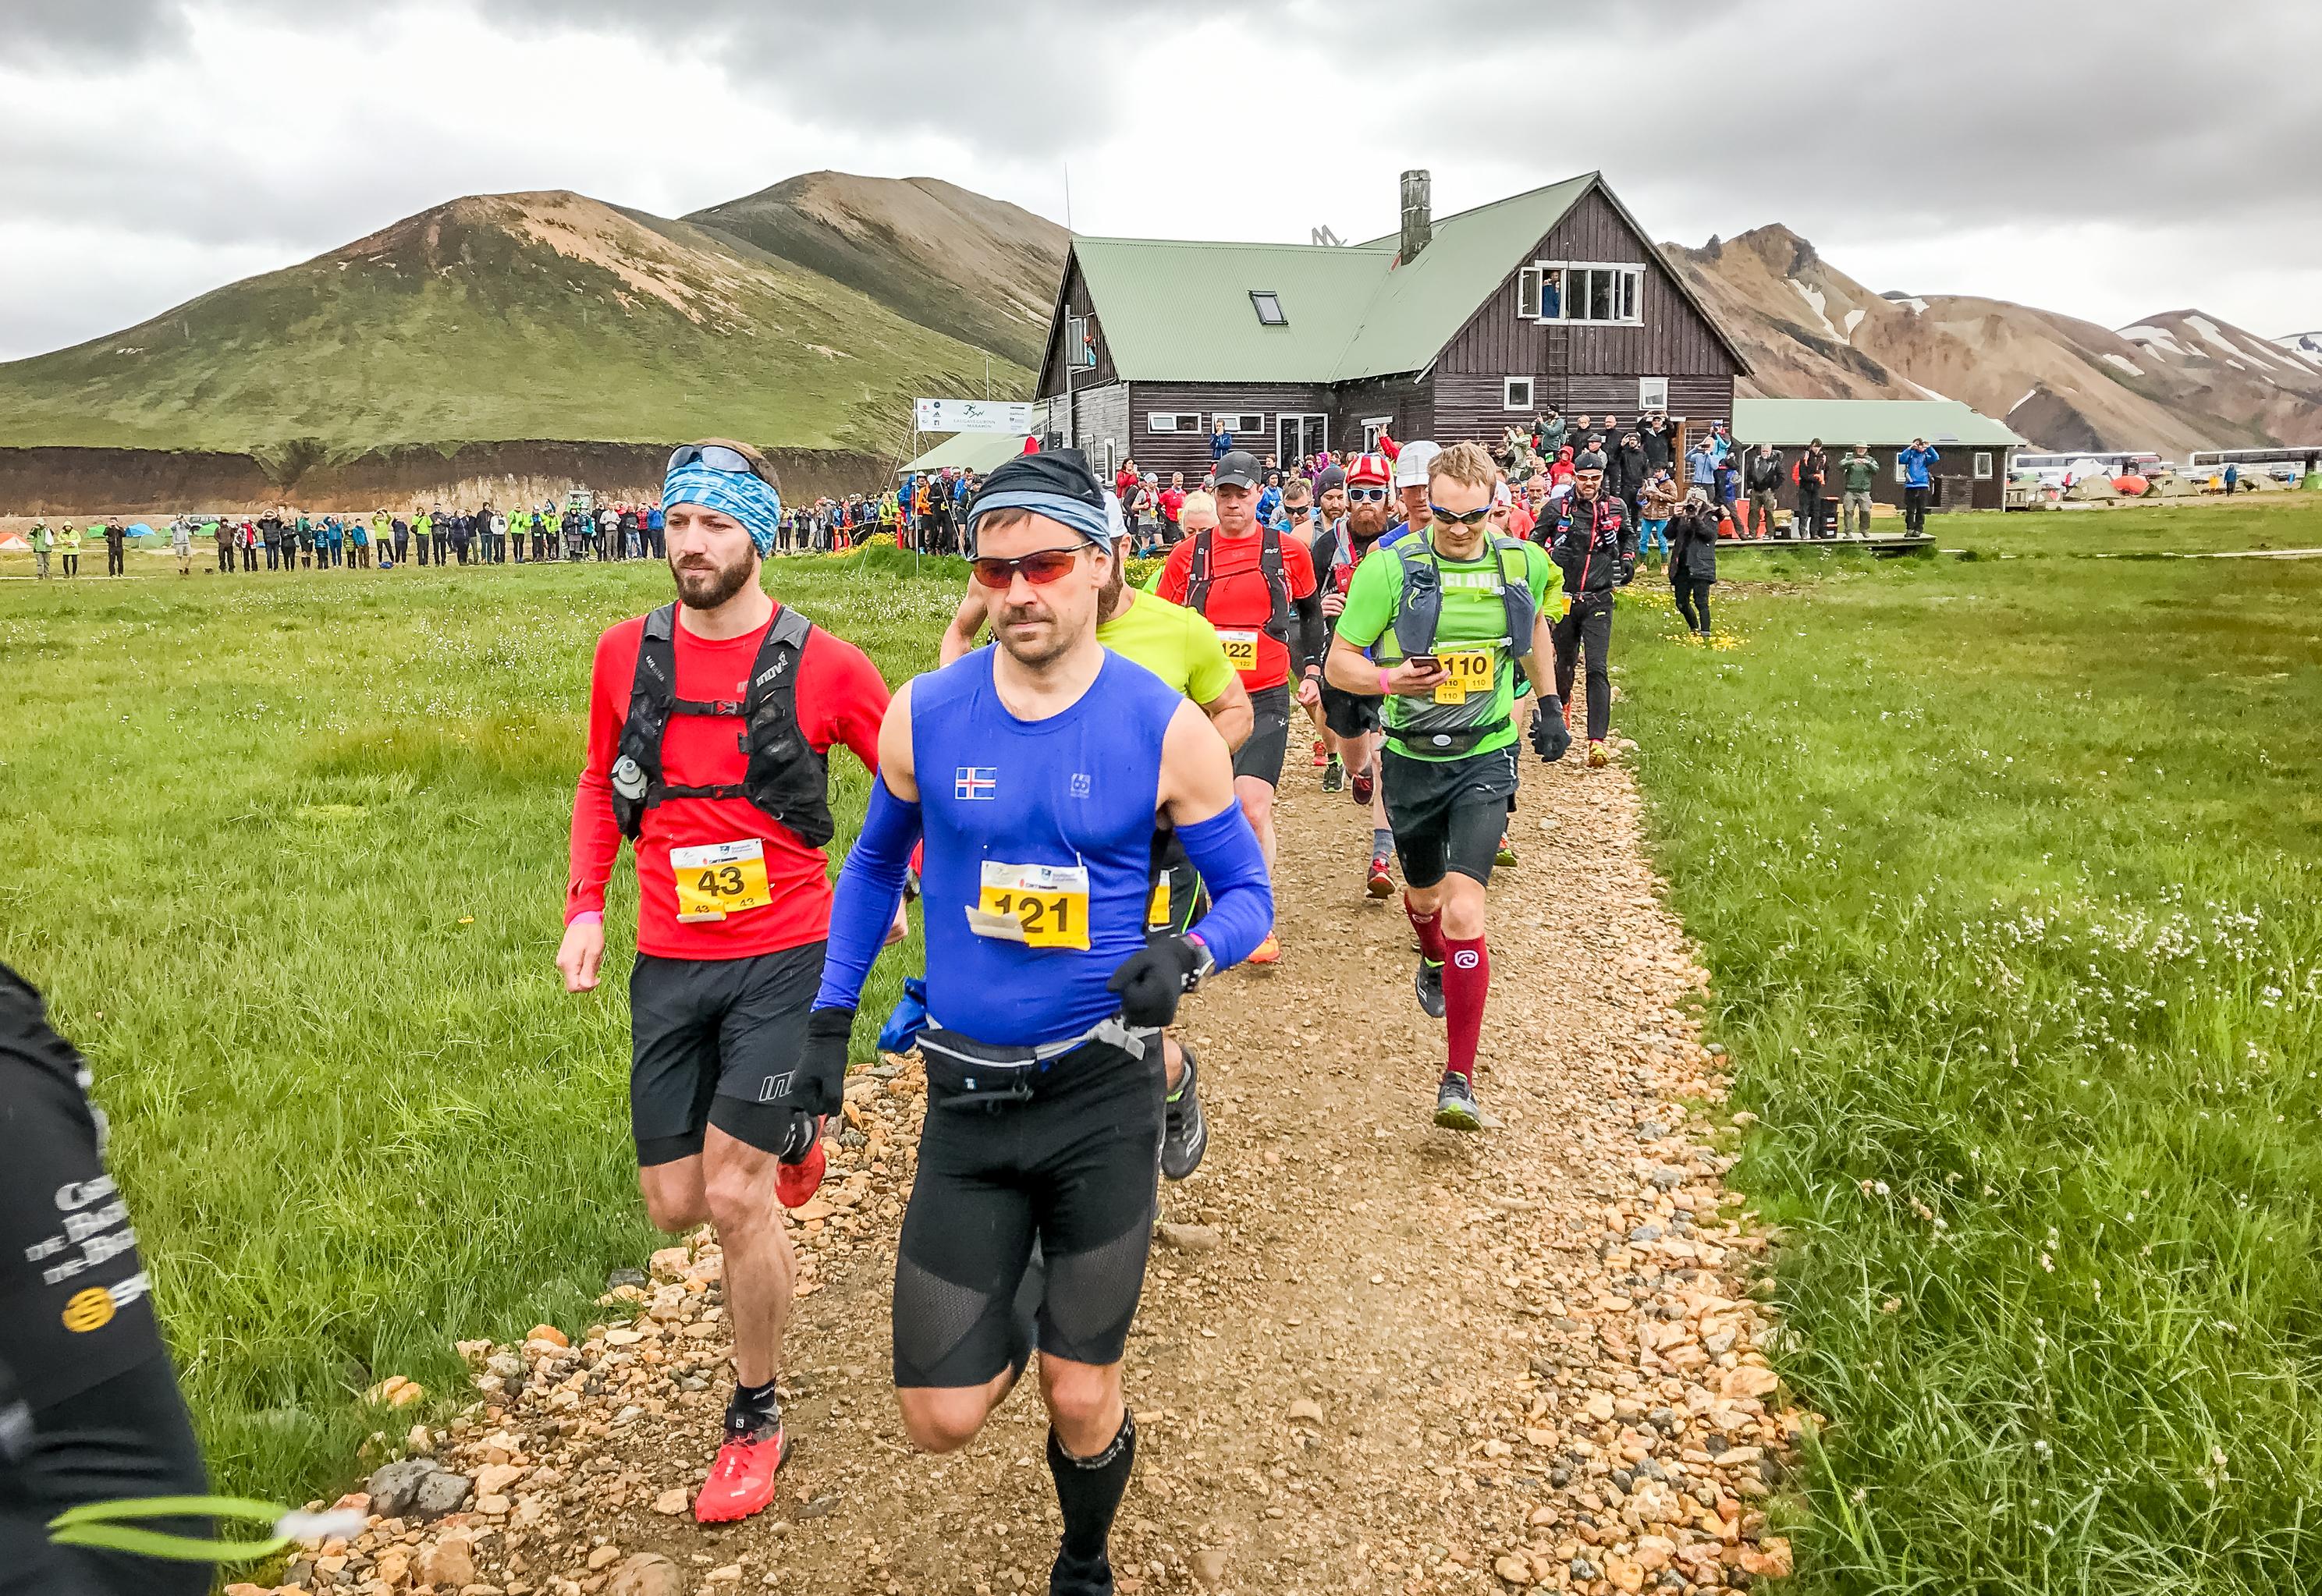 Runners starting the race in Landmannalaugar